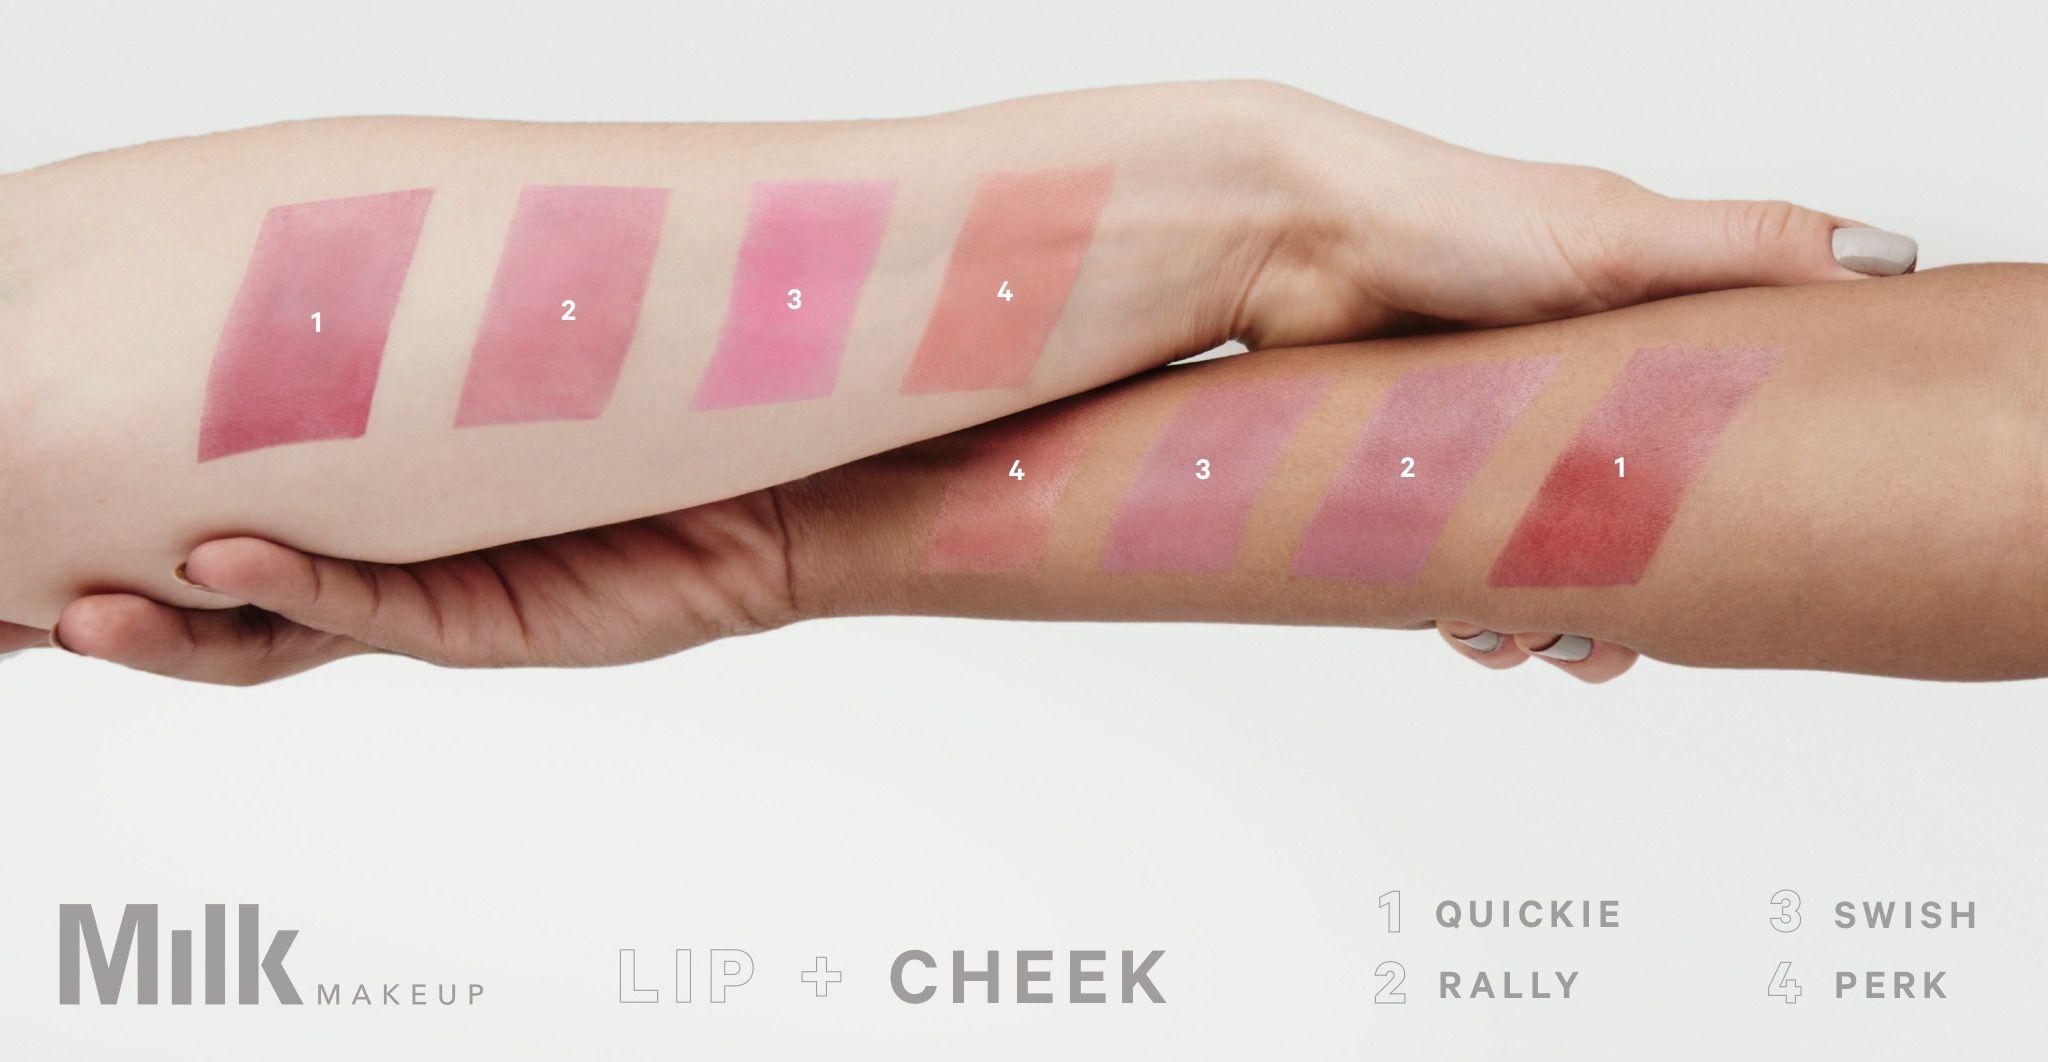 Milk Makeup lip+cheek duo My favorite is QUICKIE it looks